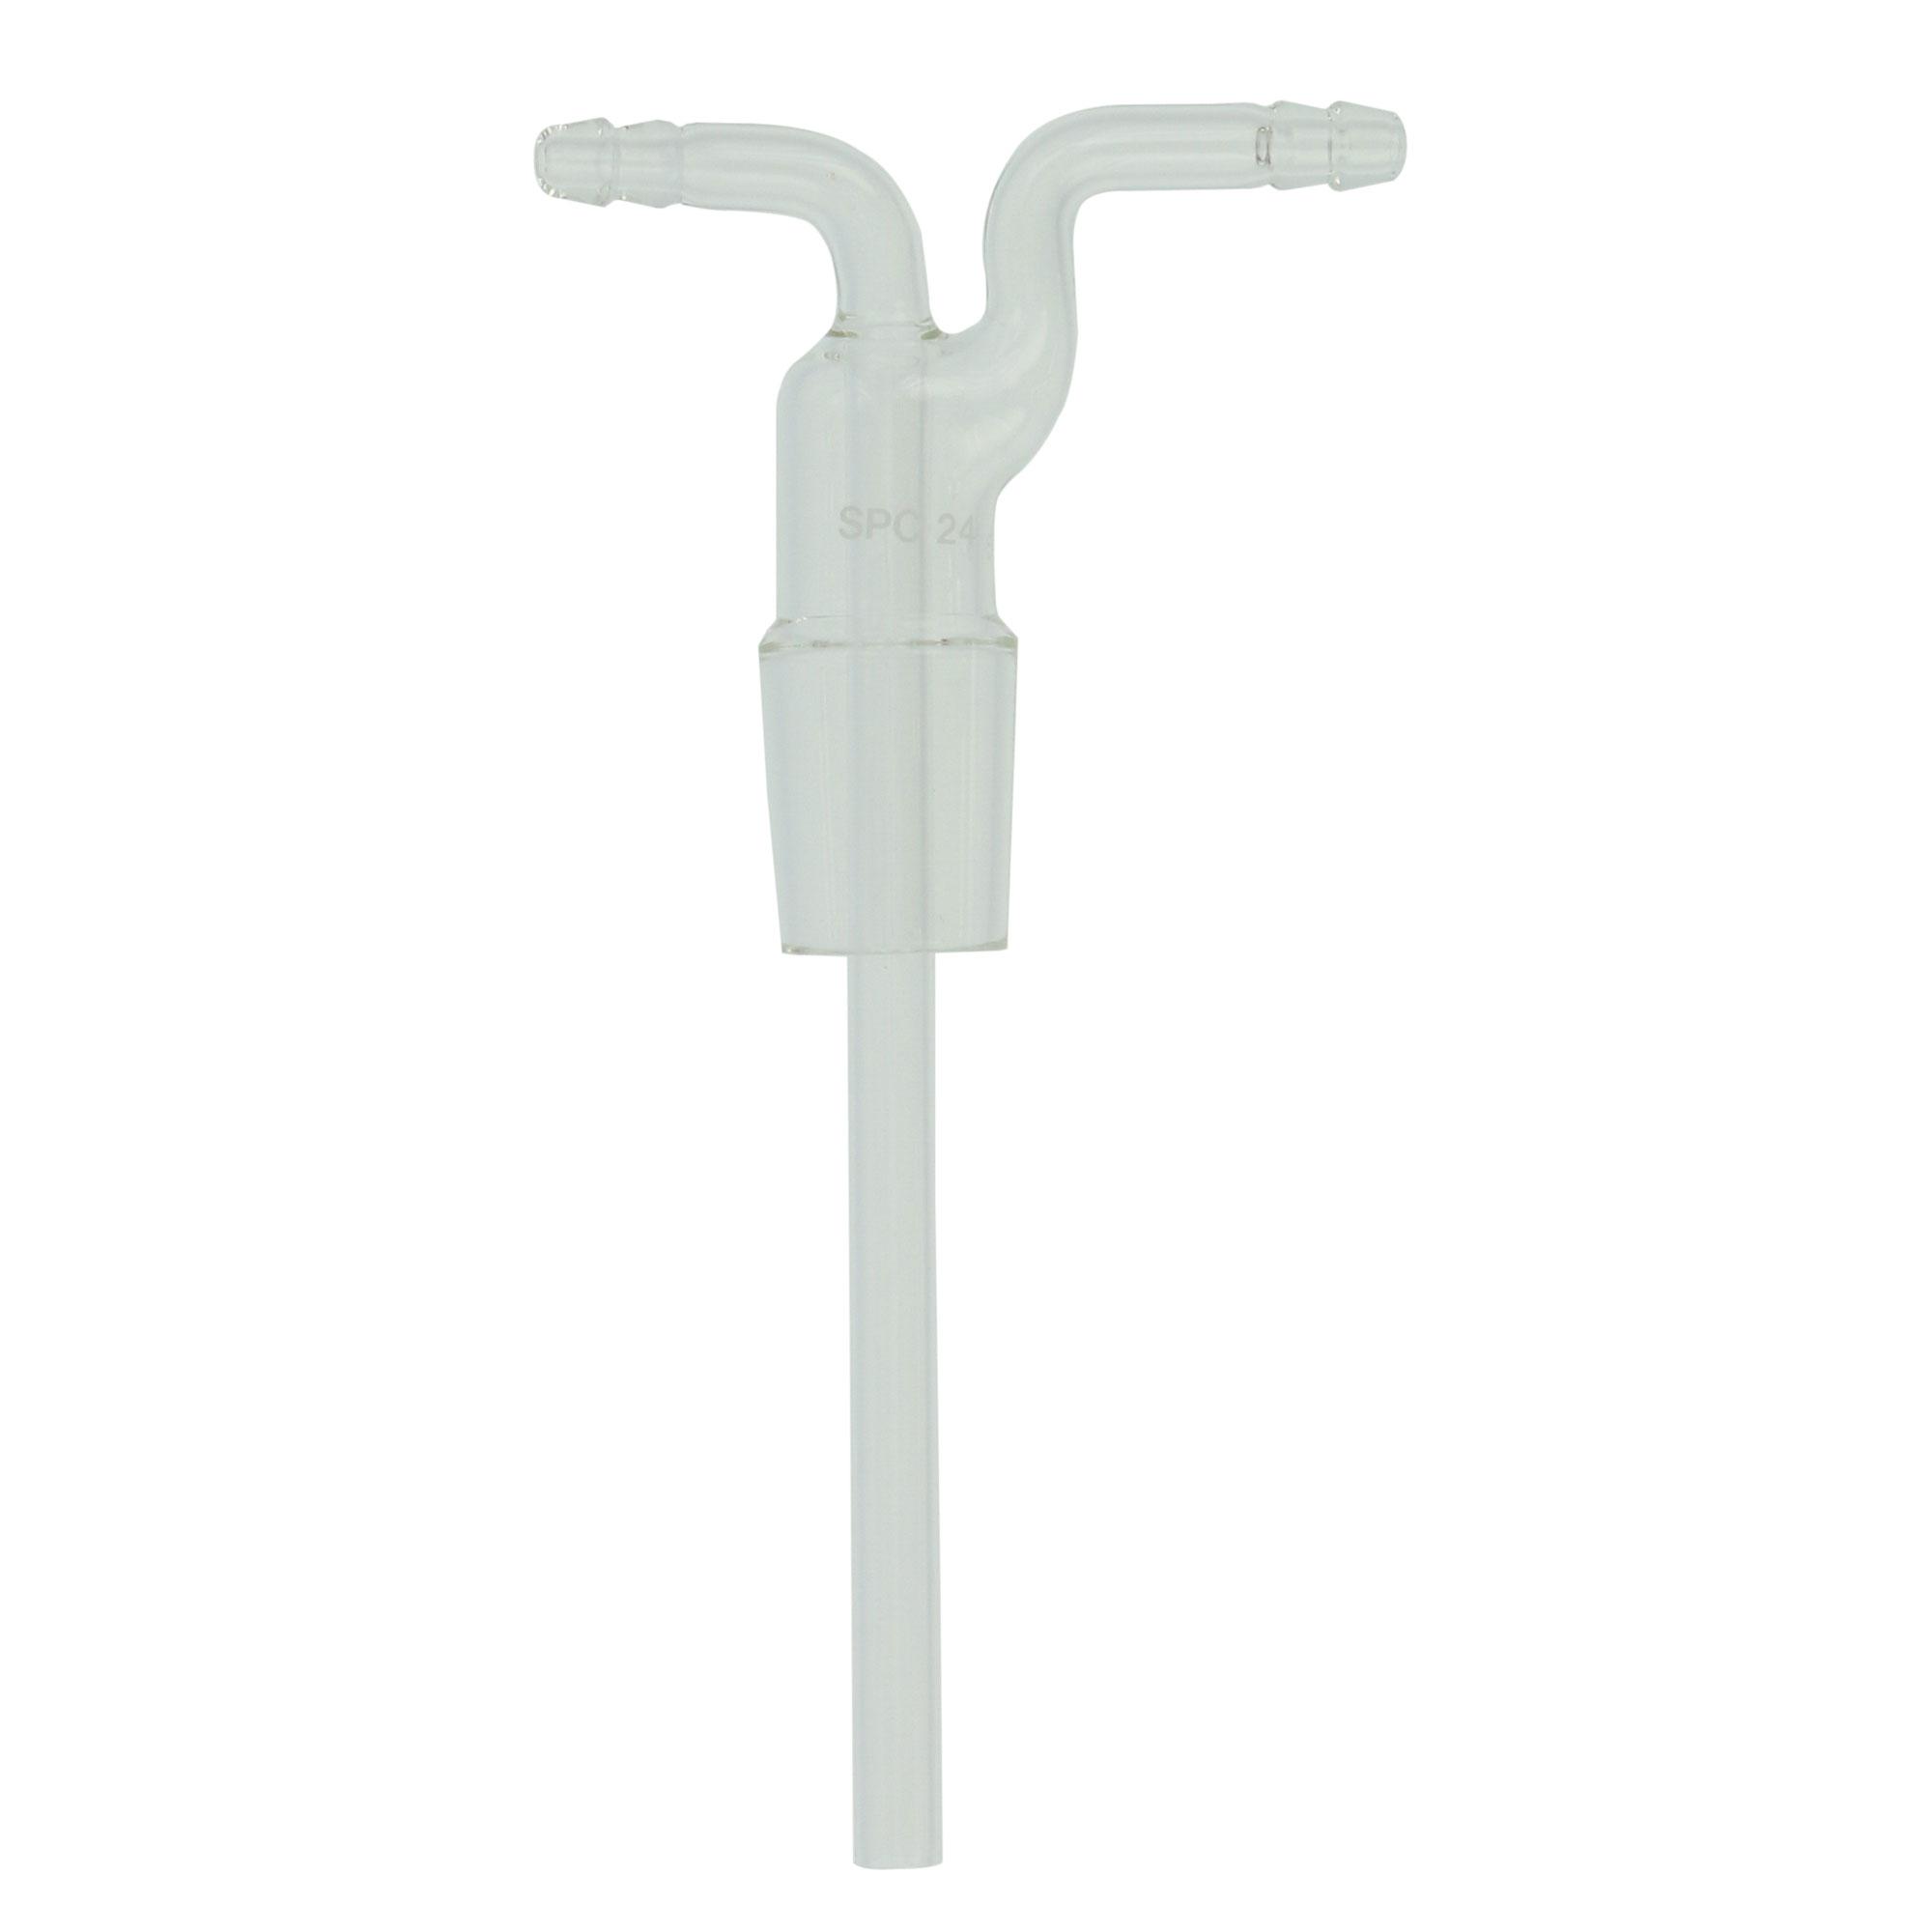 SPCガス洗浄びん三 角フラスコ形 中管 100mL用